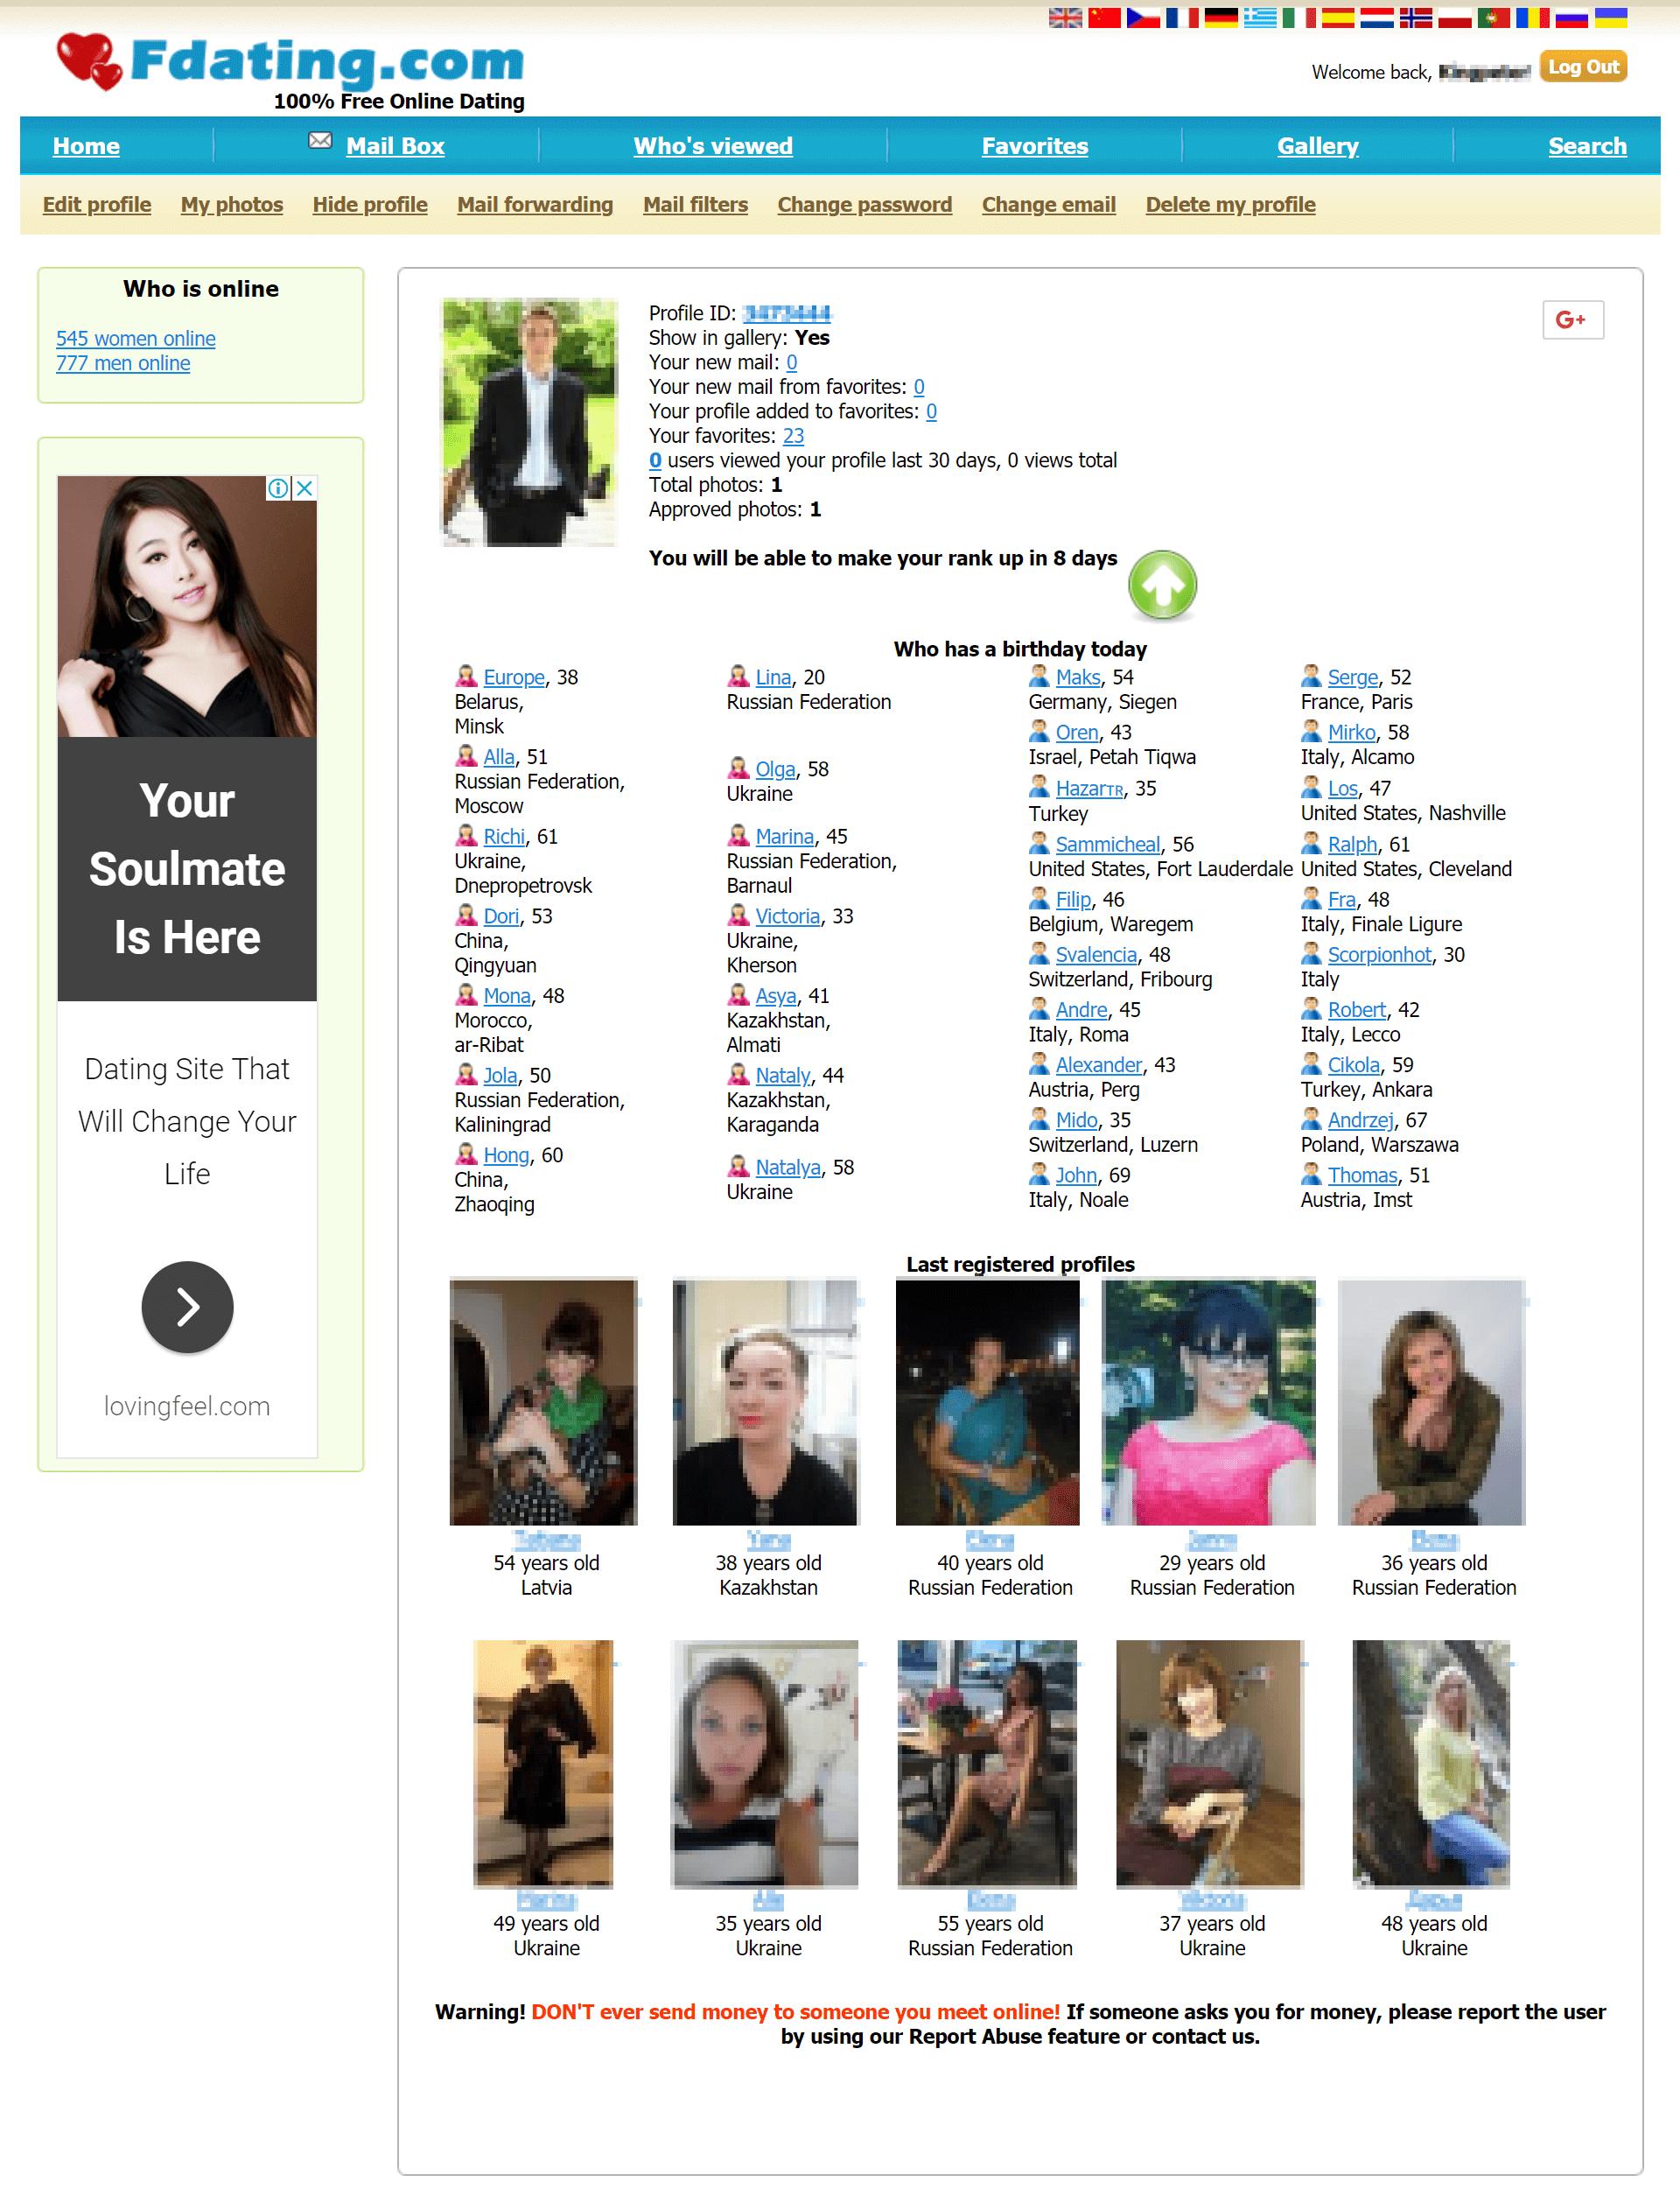 FDating Homepage